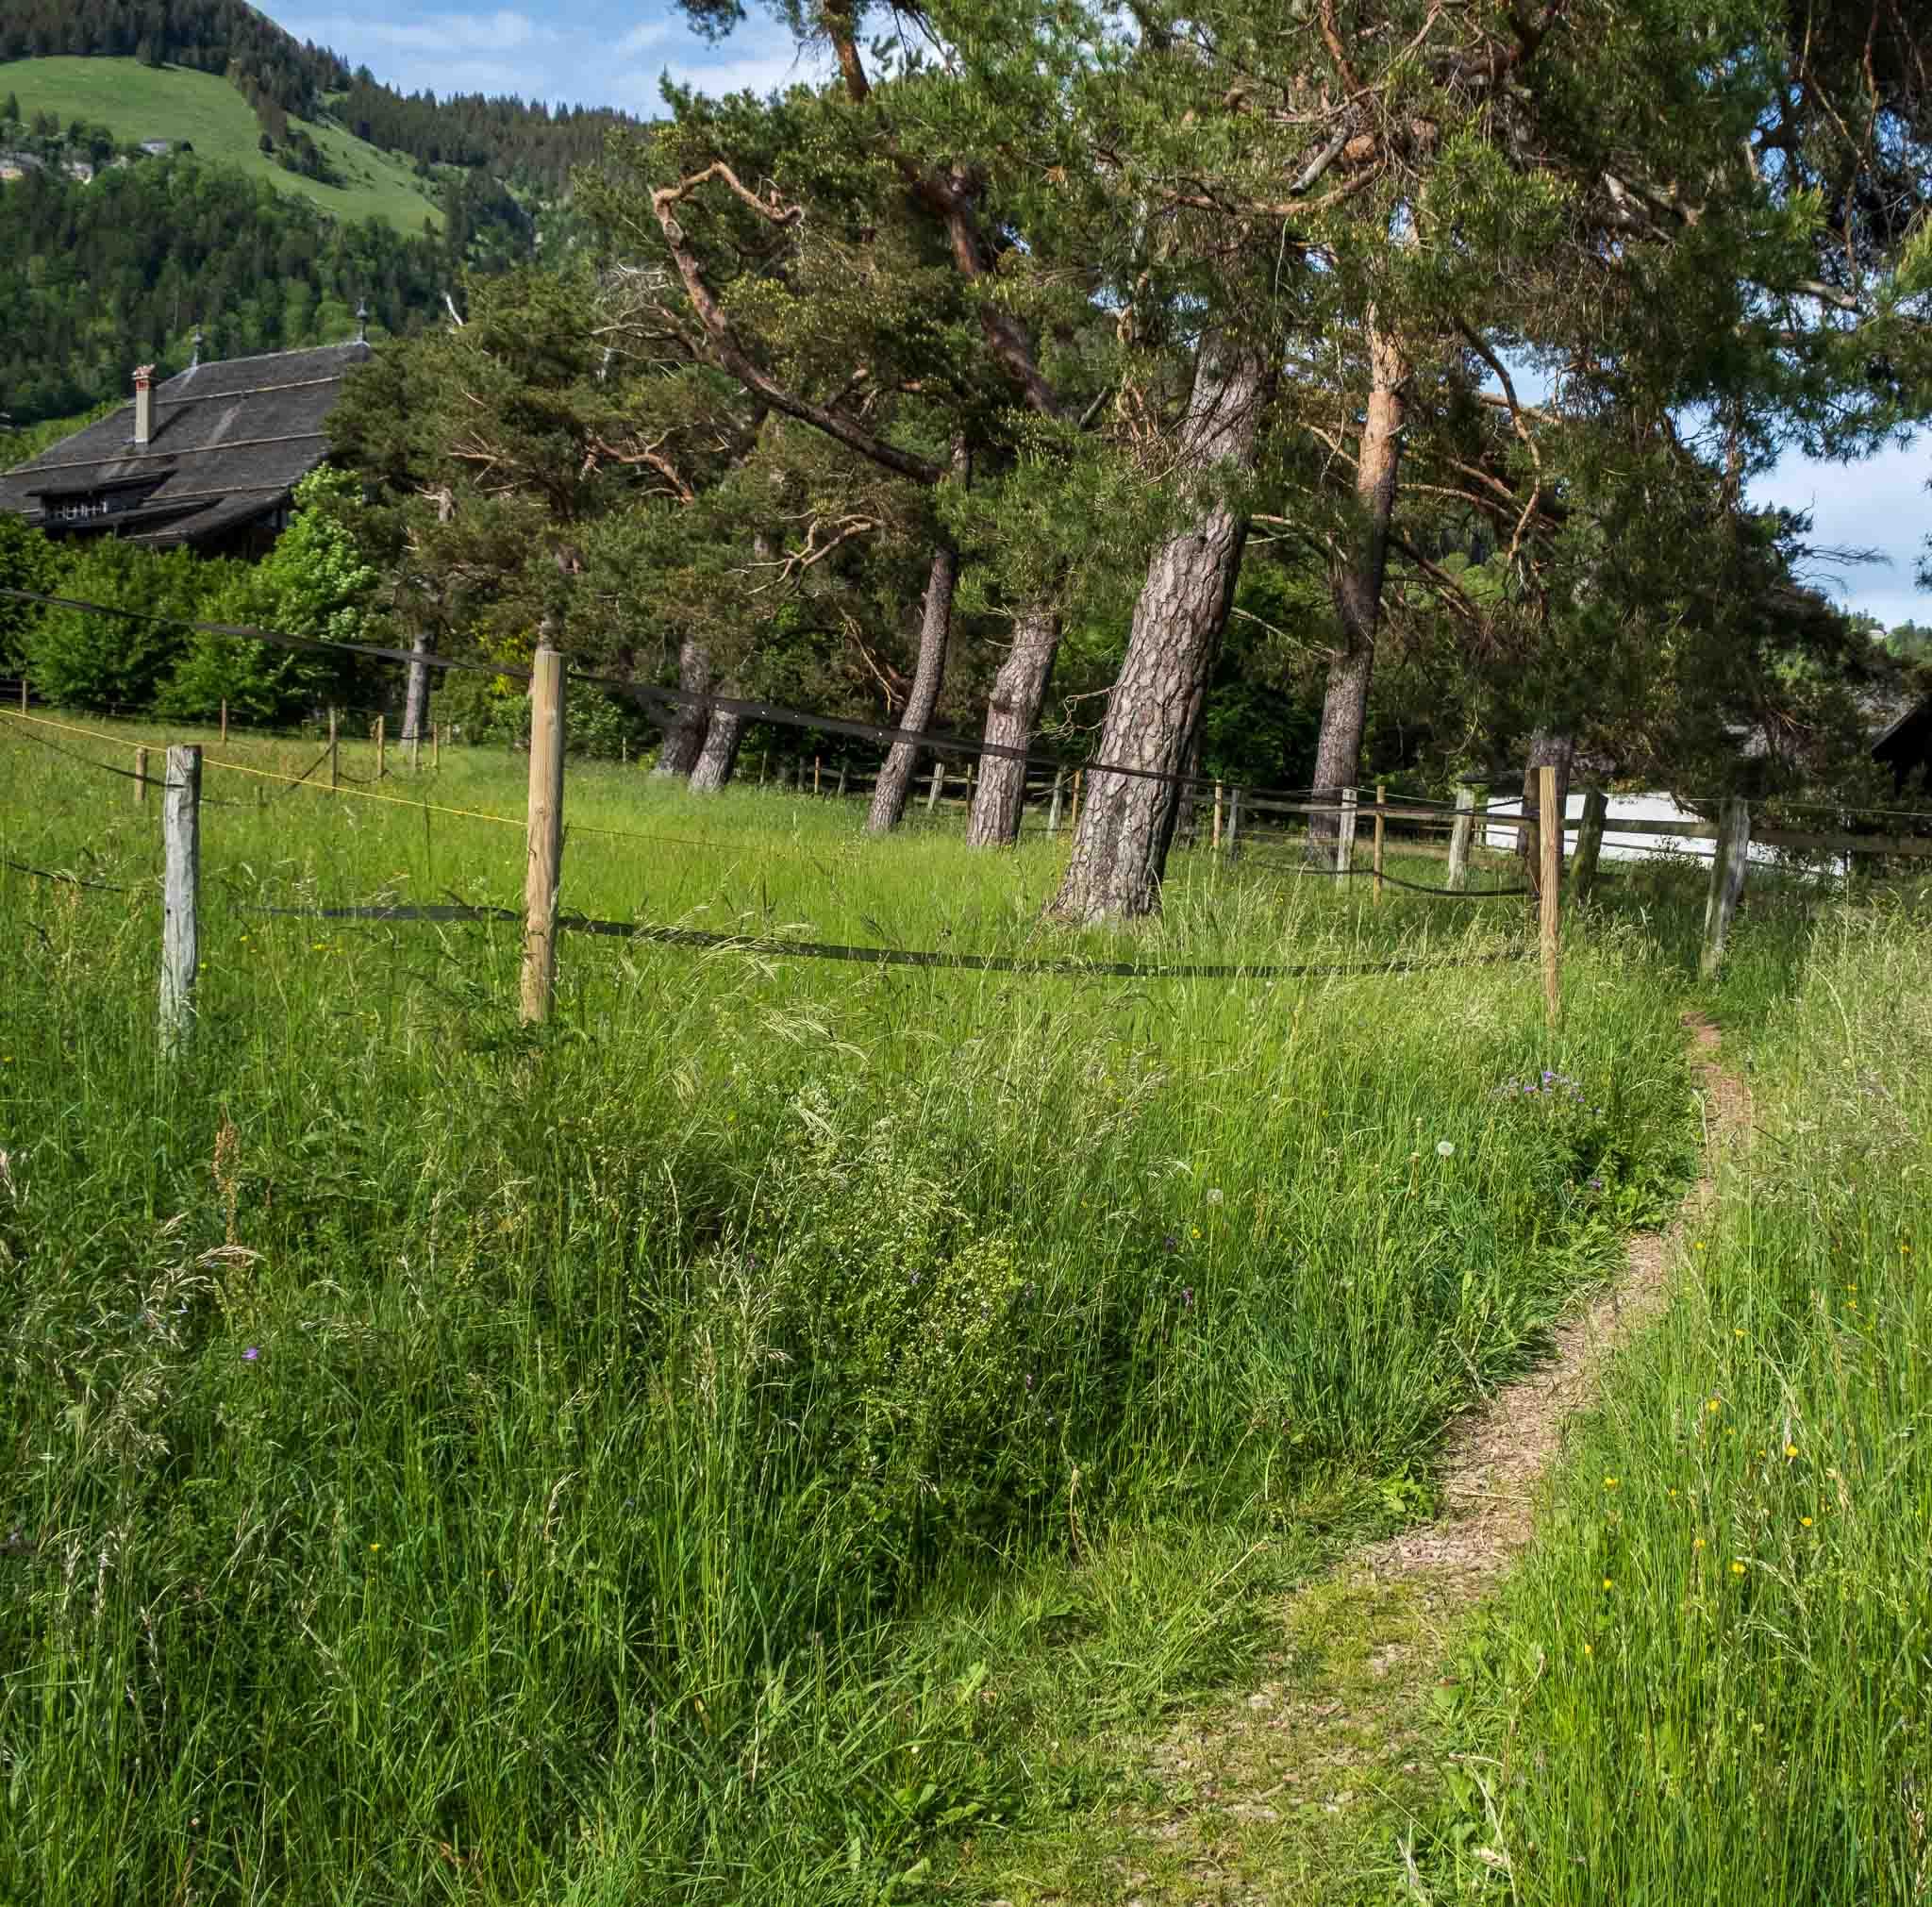 Path to the Grand Chalet on Rossinière audio tour Cowbells, Chalets and Balthus: A Swiss Alpine Village Excursion